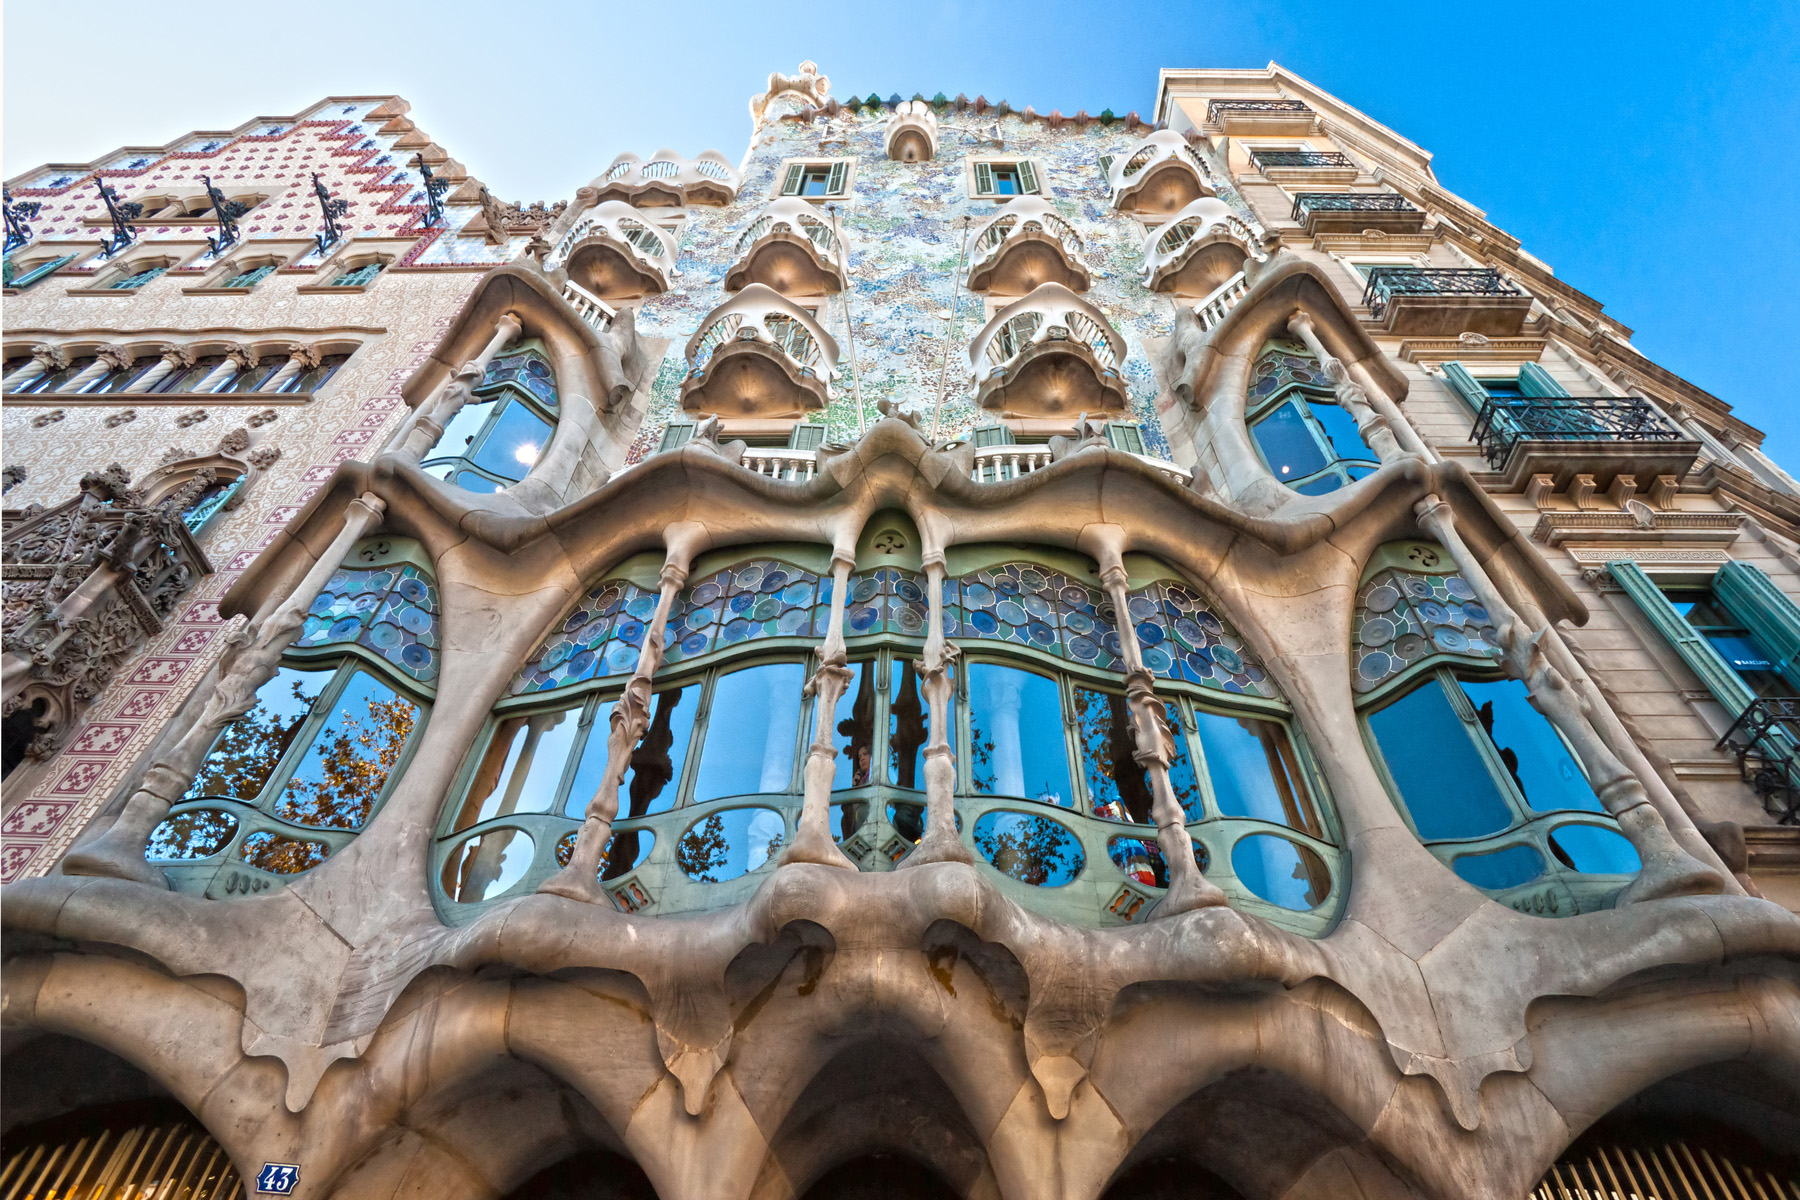 Casa Battló in Barcelona